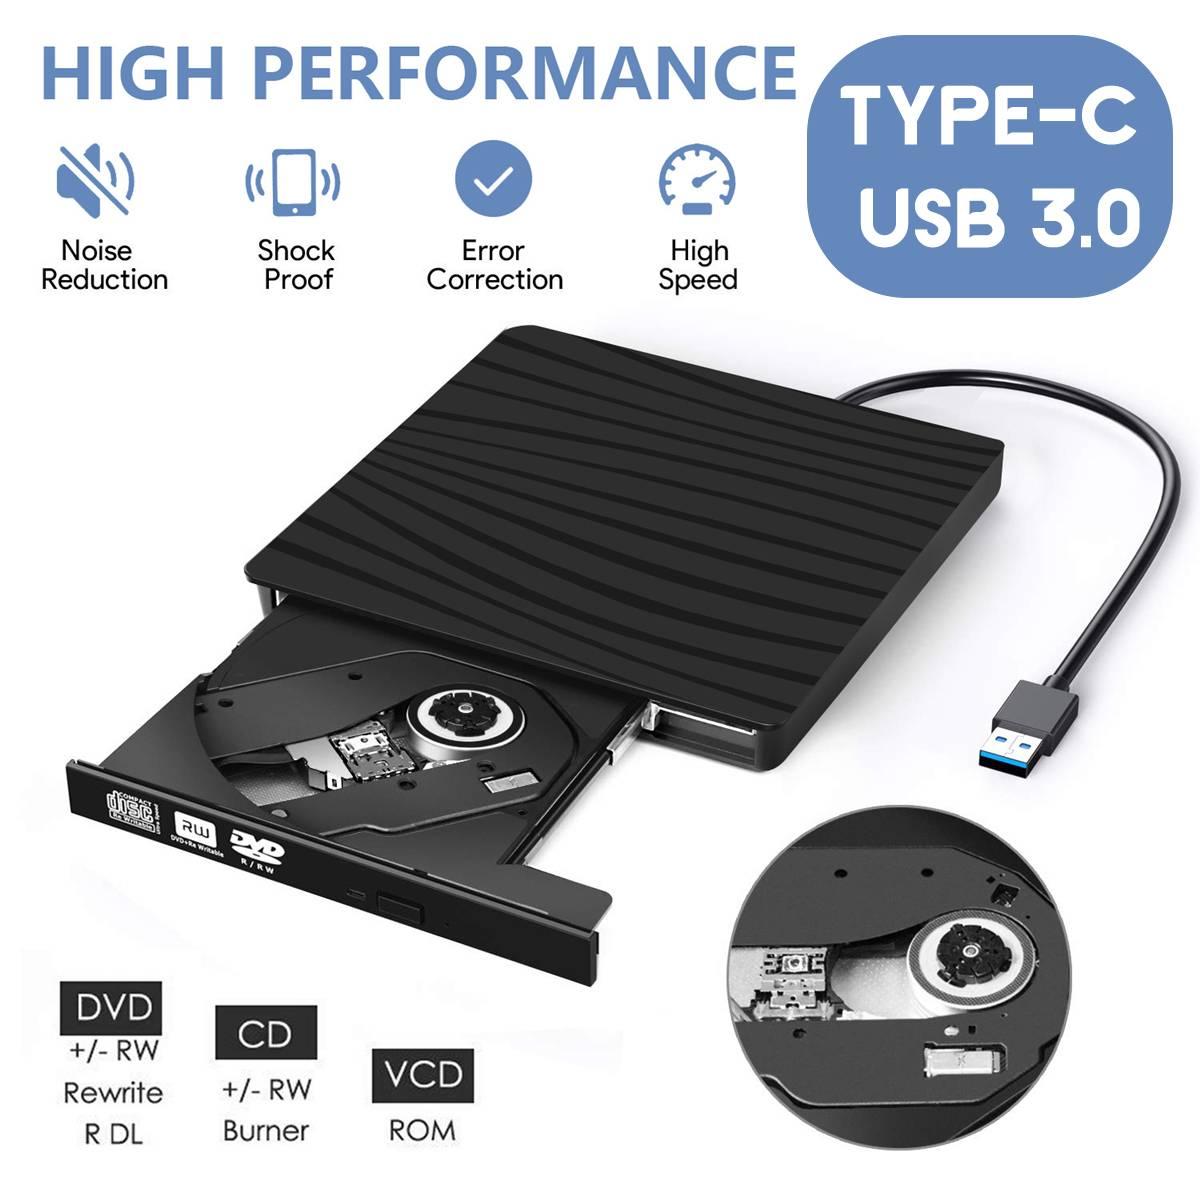 Unidad de DVD externa, Unidad óptica USB 3,0 tipo C/USB, reproductor de CD ROM de alta velocidad, grabador de CD-RW, grabador de grabadora para portátil y PC F8331-smartphone Sony Xperia XZ F8331, Original libre, 4G LTE, 3GB de RAM de ROM, 32GB, Quad Core, Android 5,2